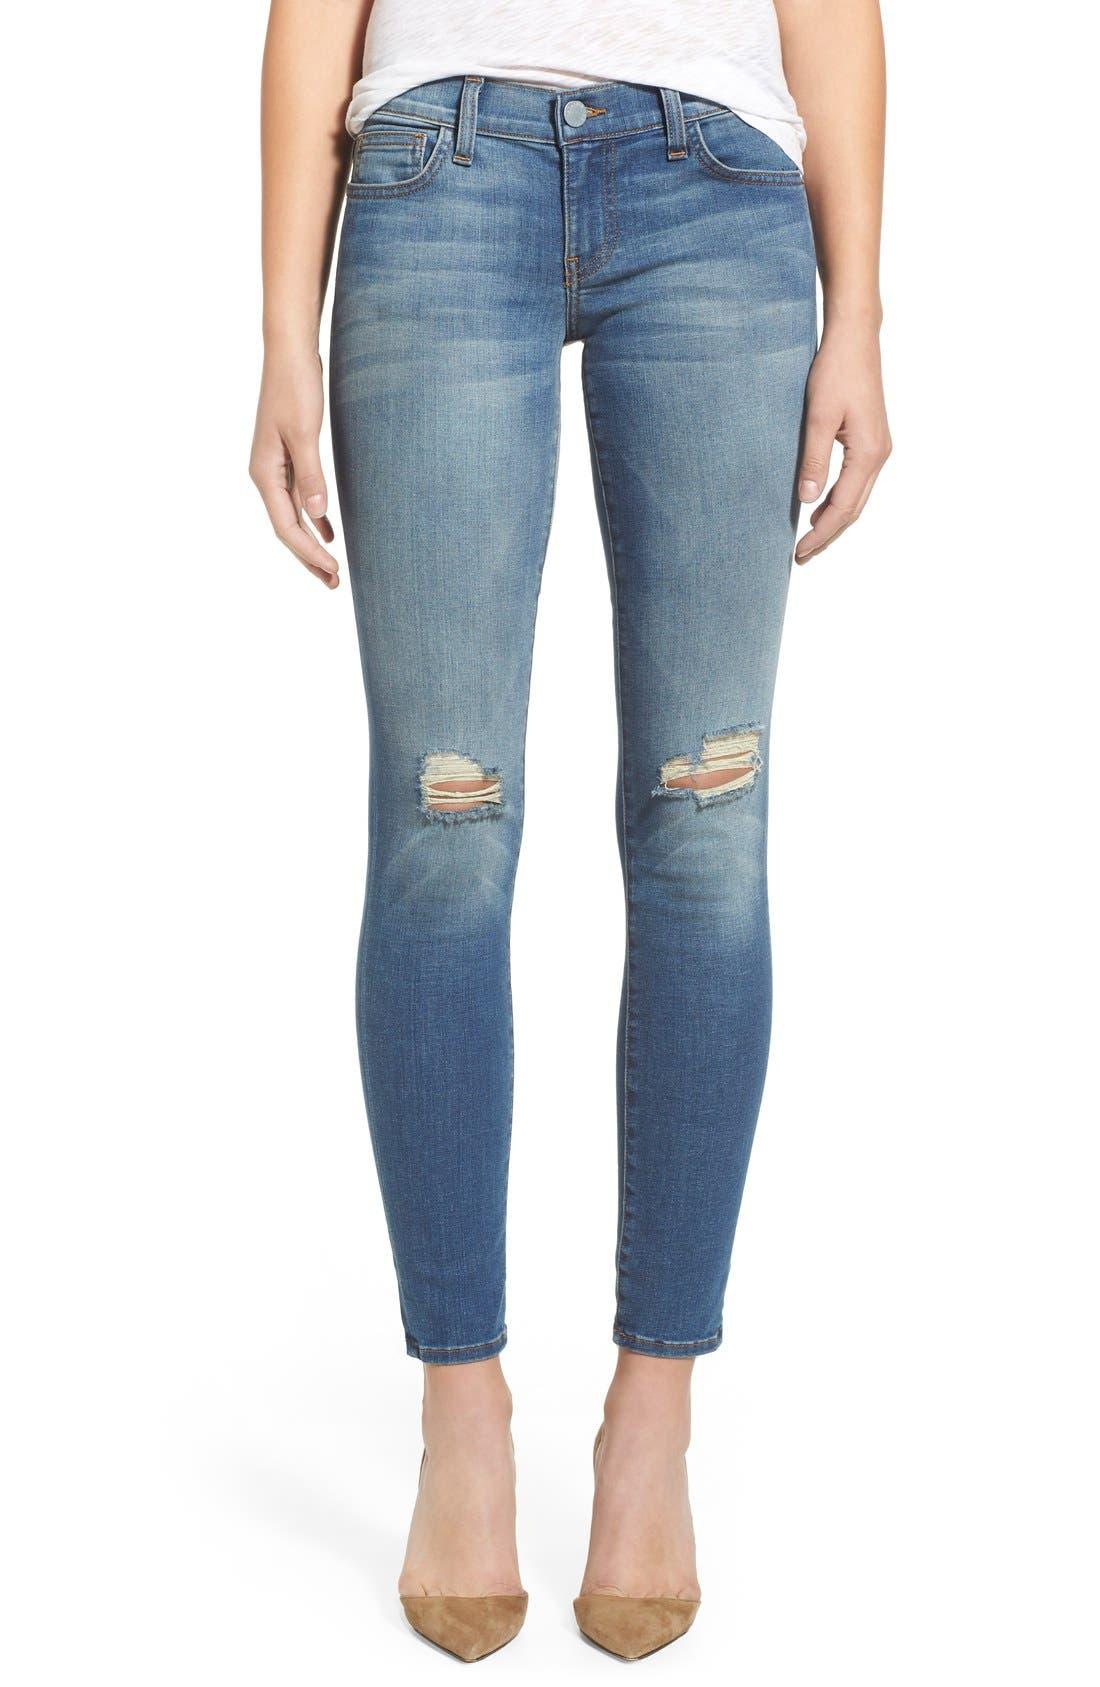 REBECCA MINKOFF 'Jane' Skinny Jeans, Main, color, 400